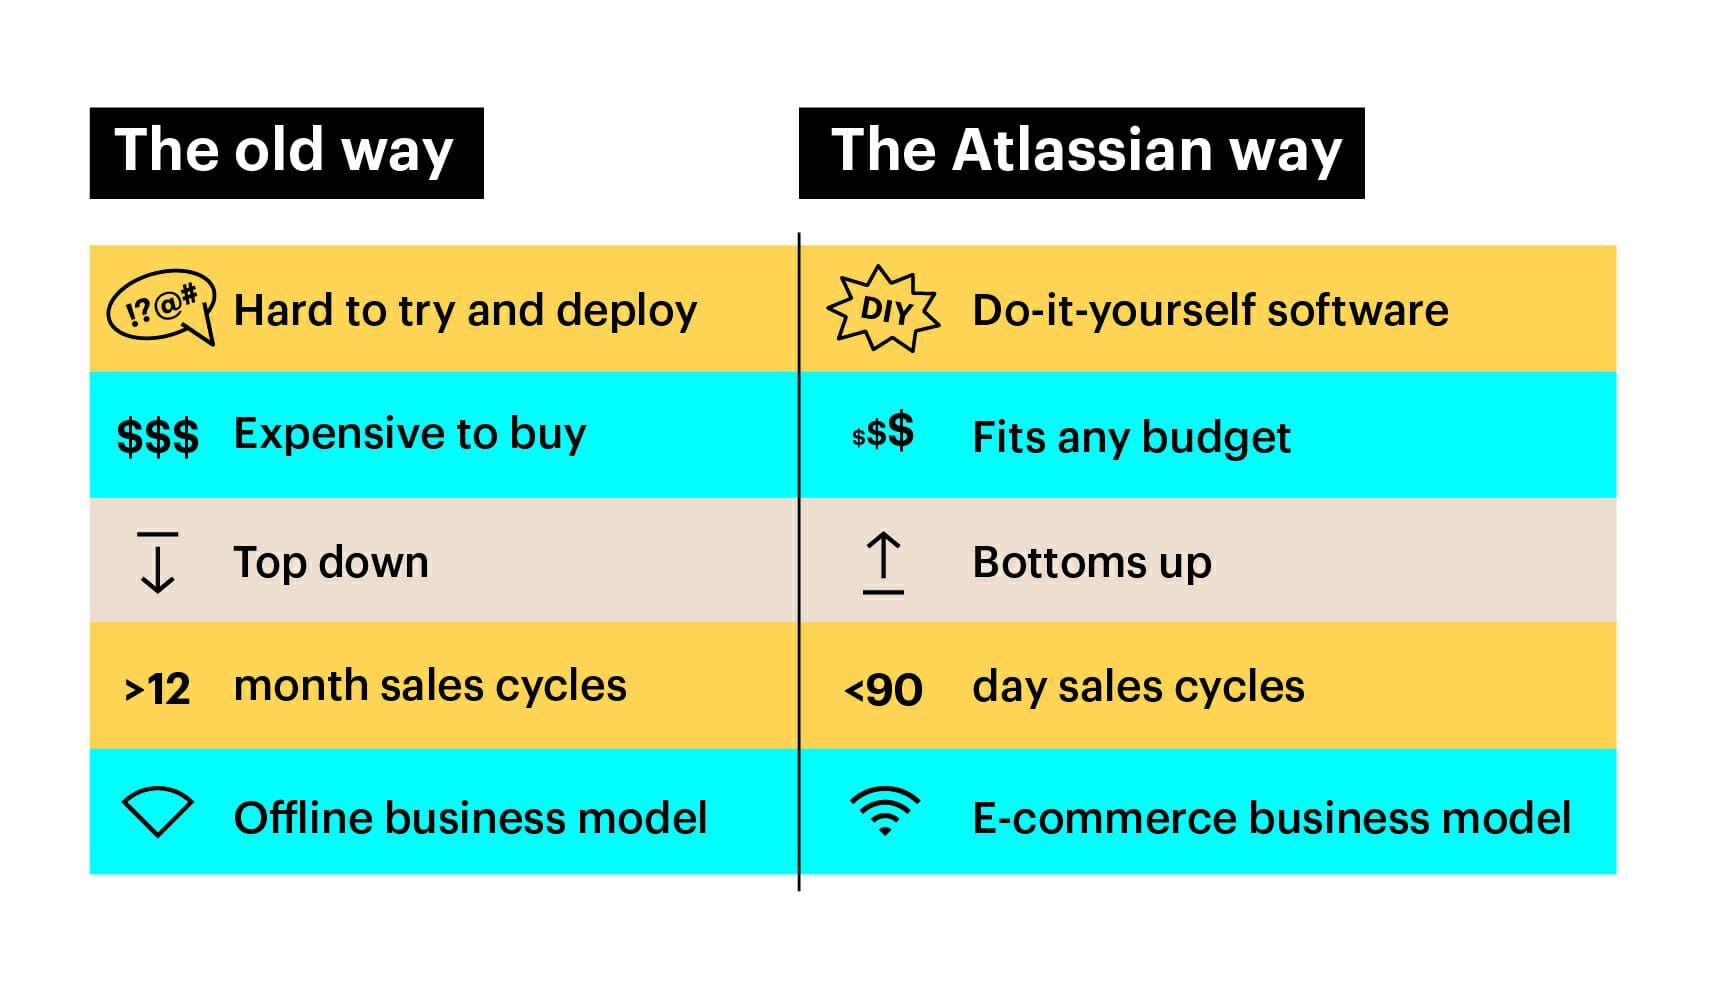 the atlassian way